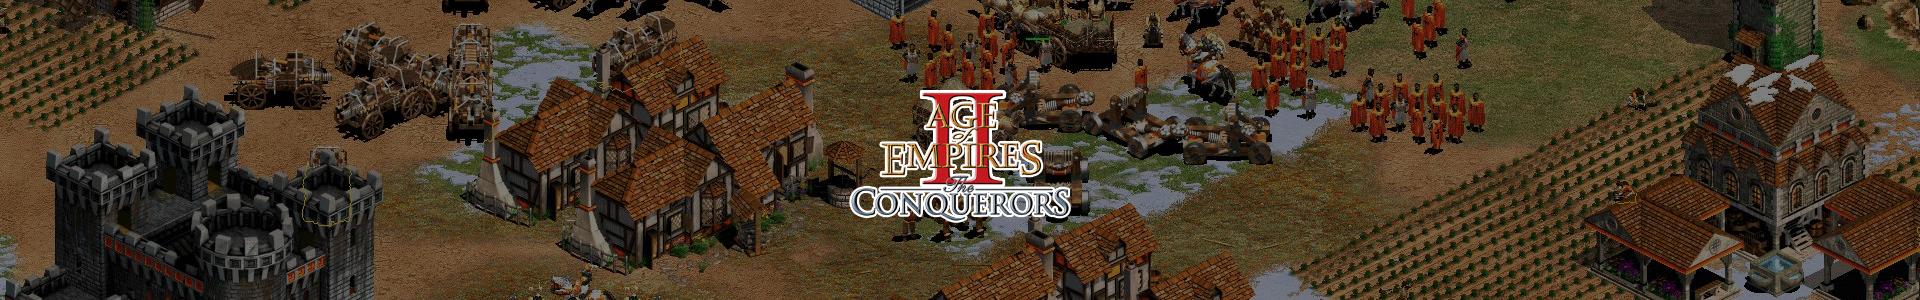 Age of Empires II statistics